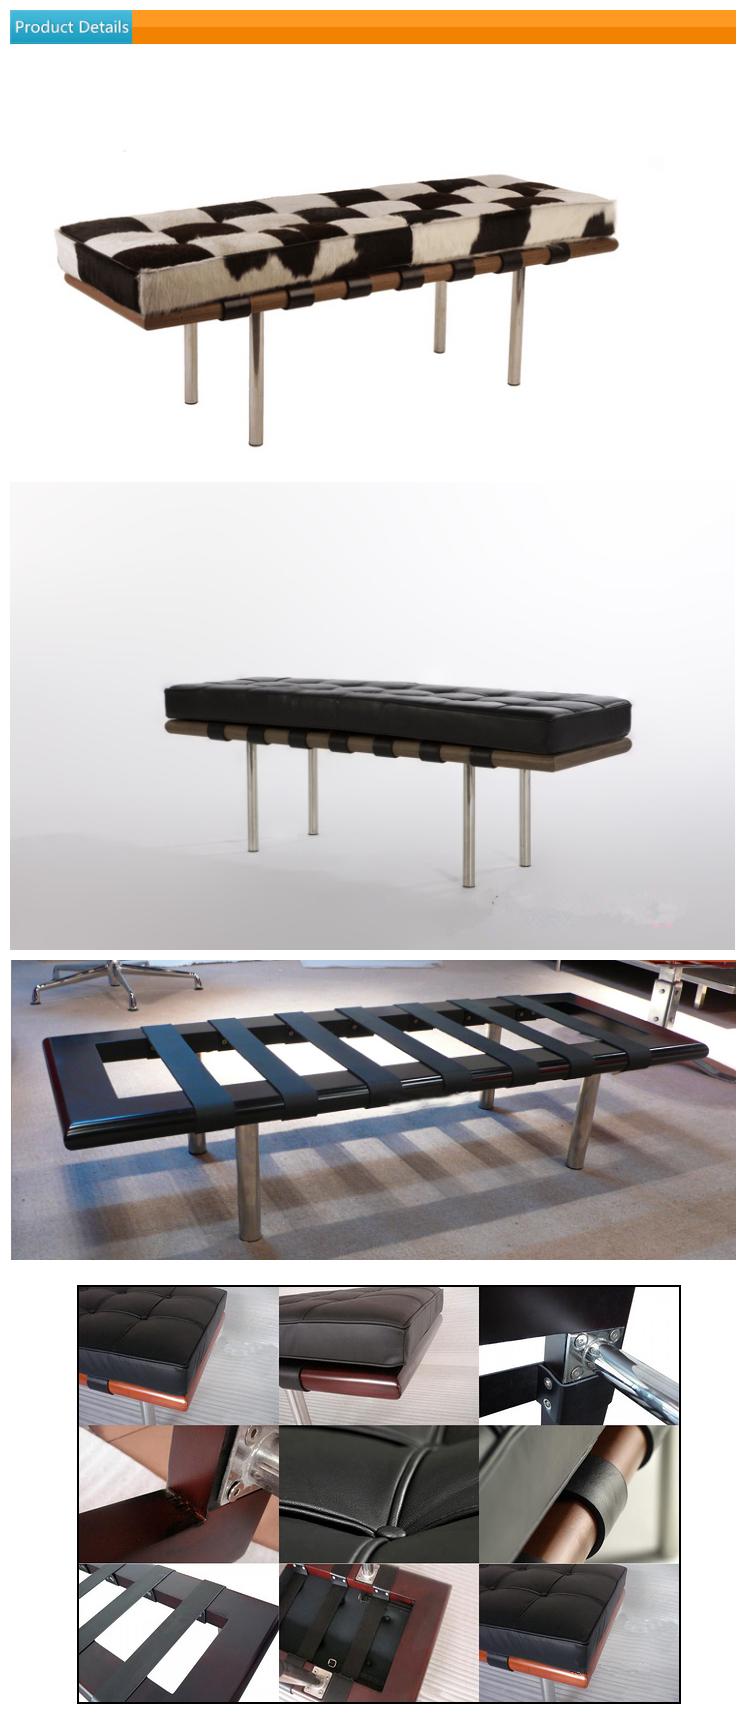 Moderne polstermöbel leder  leder barcelona Bank von moderne polstermöbel-Wohnzimmer Sofa ...